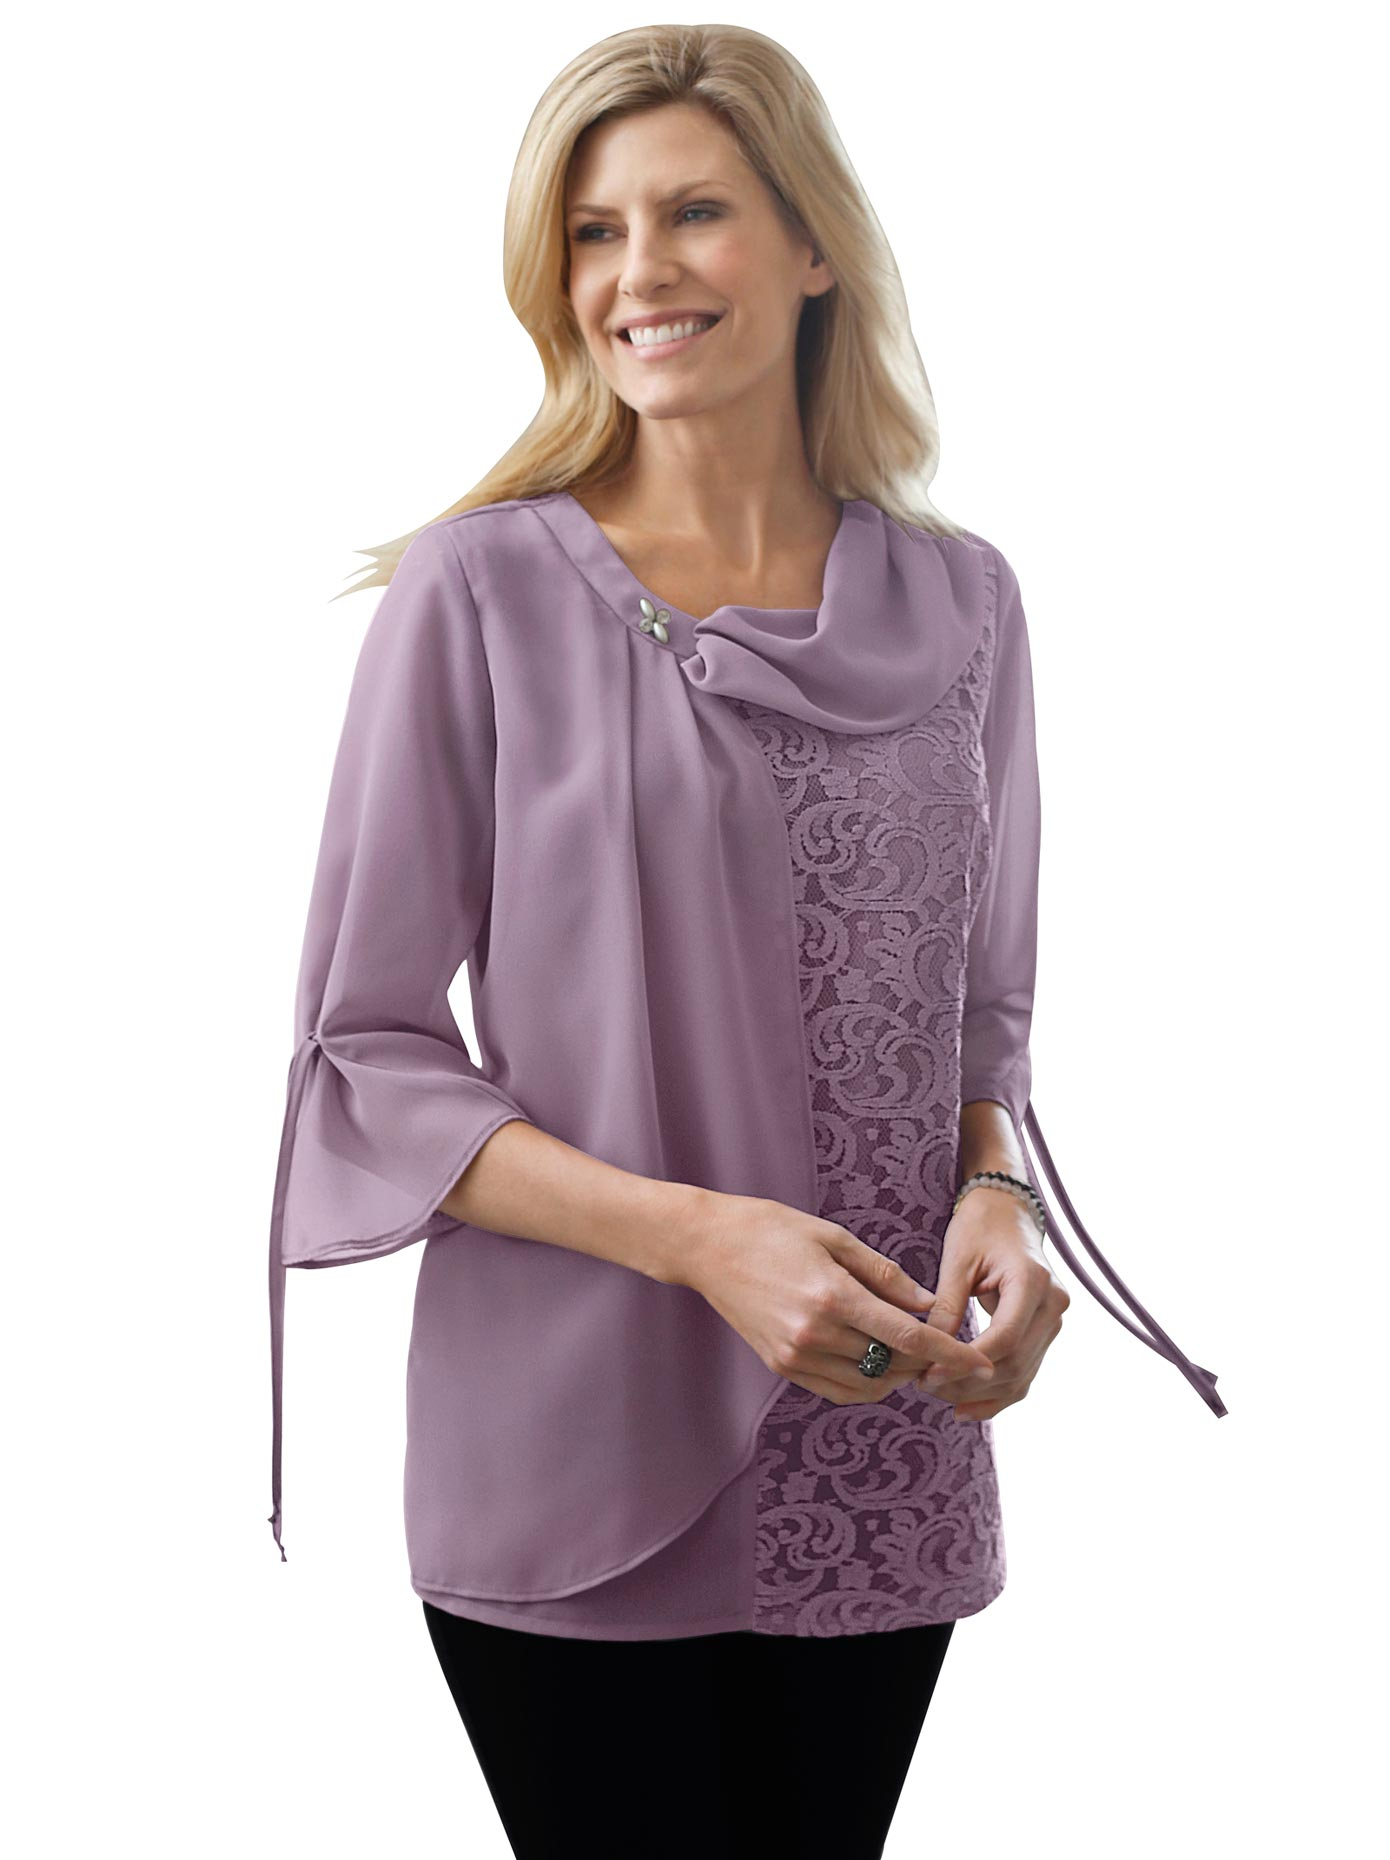 Classic Basics Bluse mit raffiniertem Ausschnitt